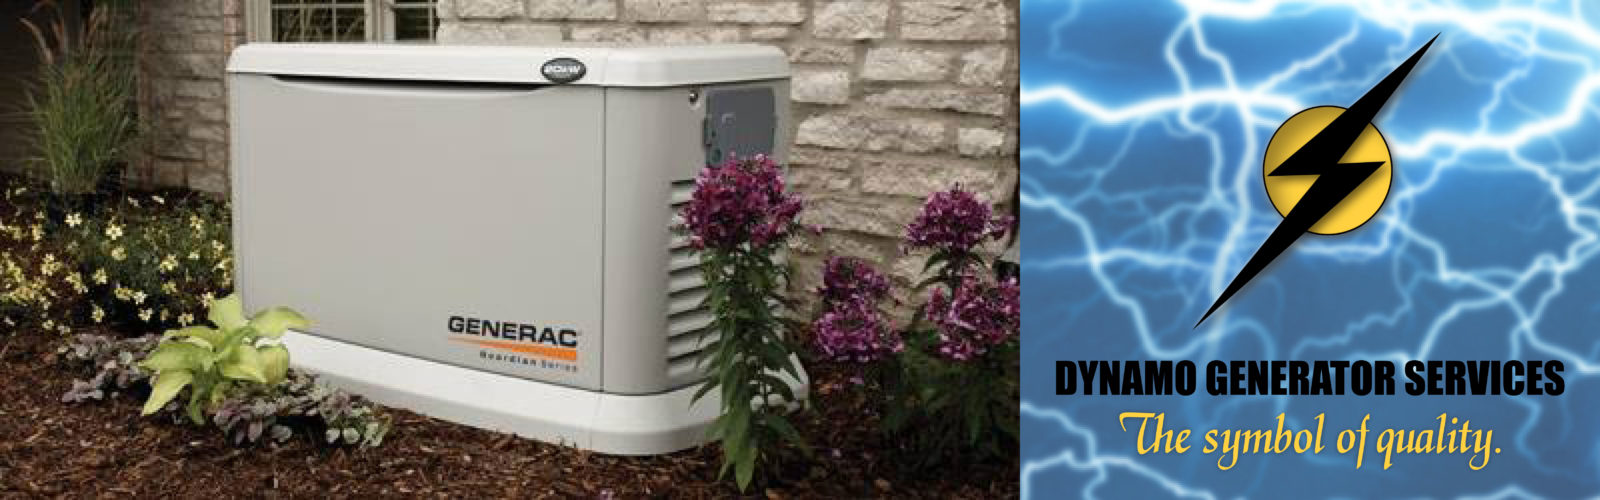 Dynamo Electric - Generac Whole House Generator Distributor - Williamsburg Area of VA